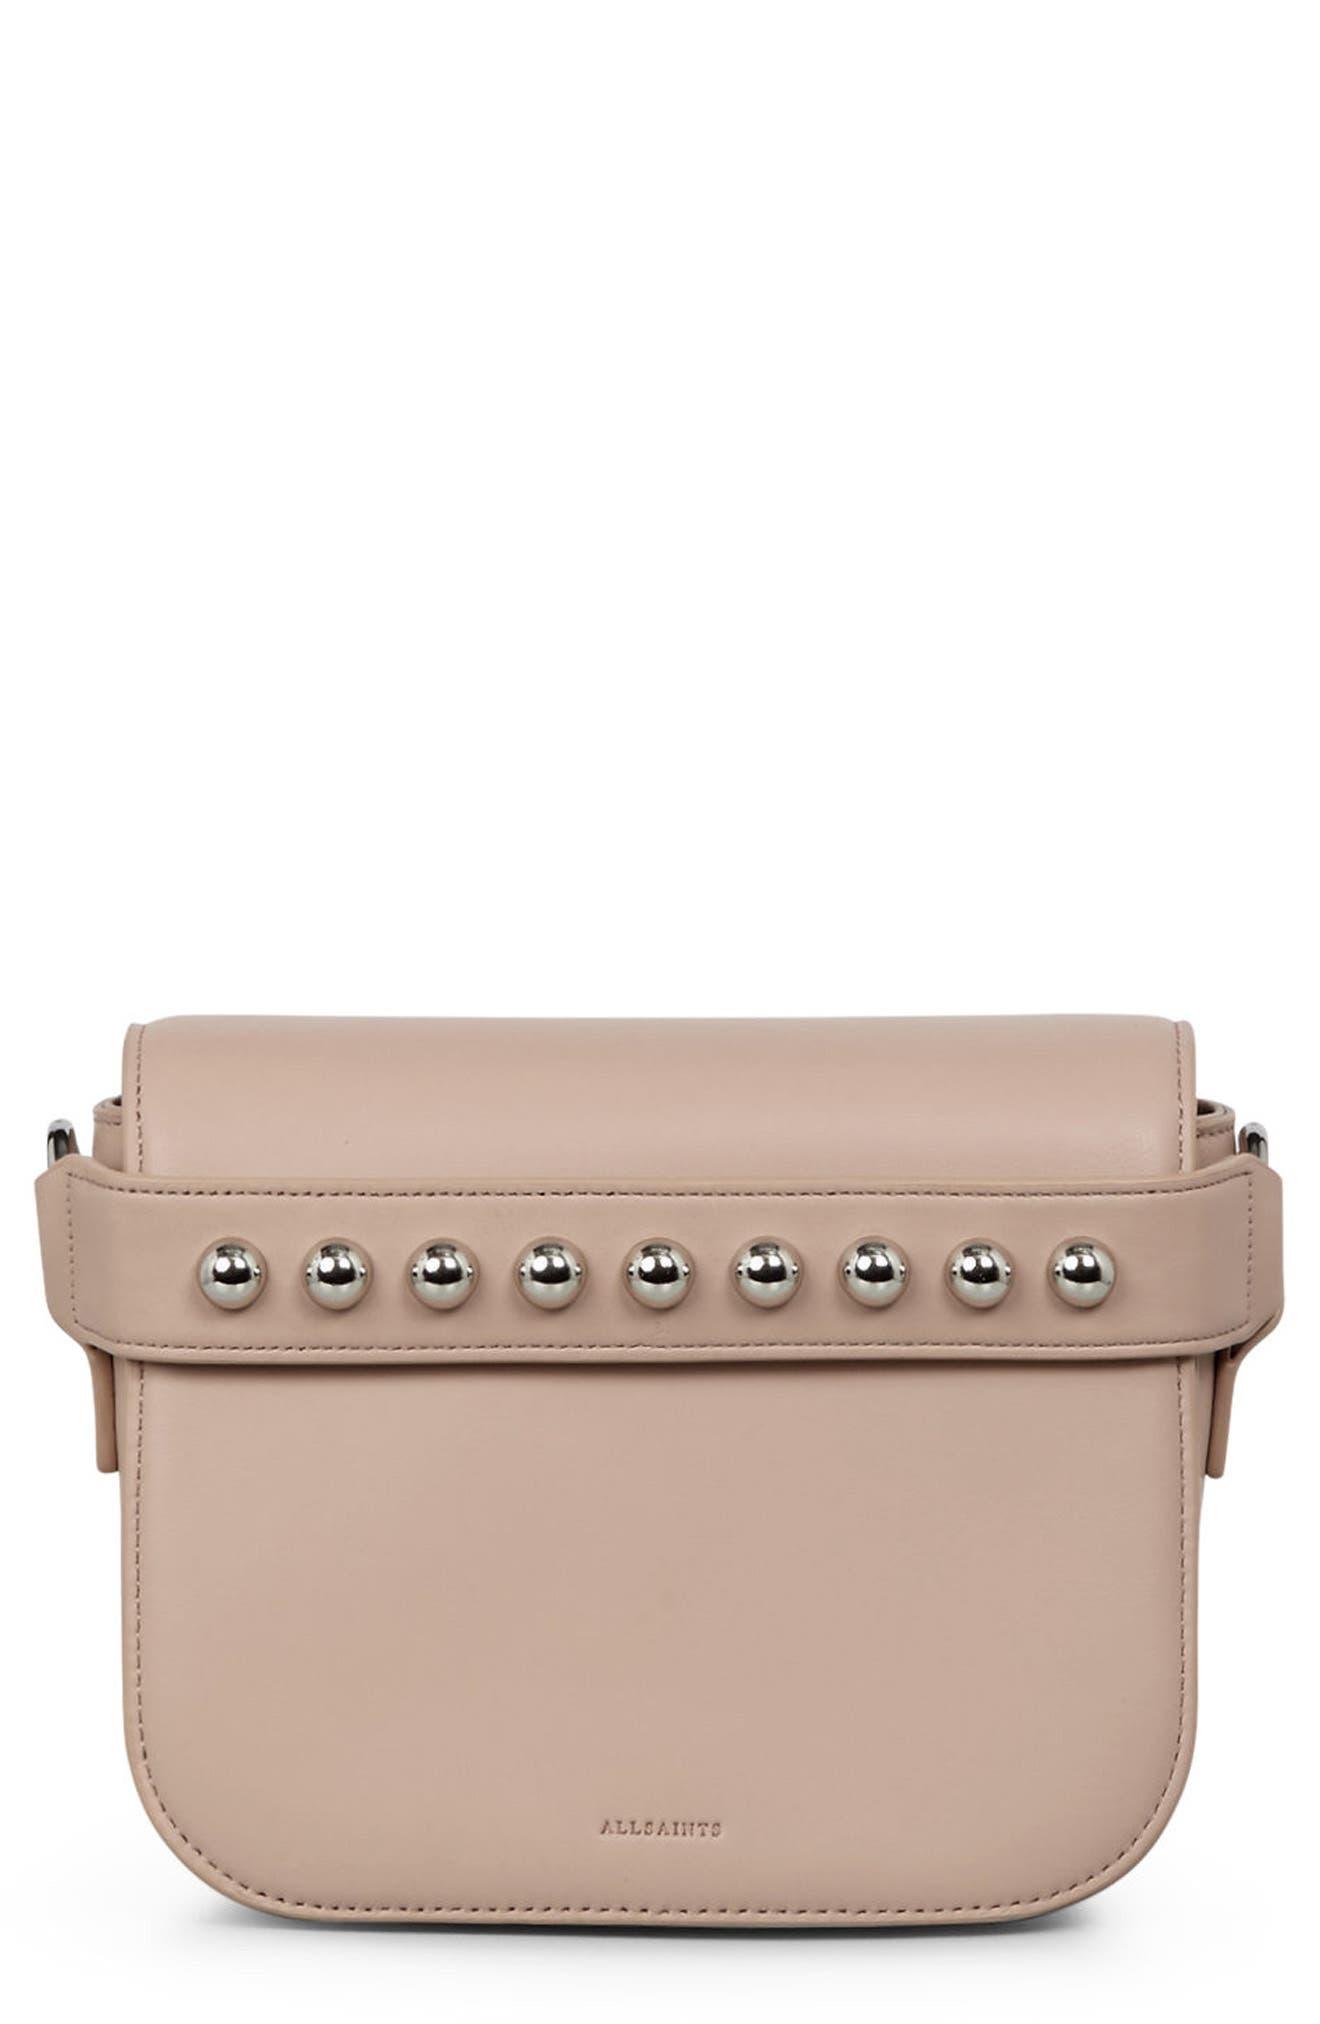 ALLSAINTS Suzi Studded Leather Clutch